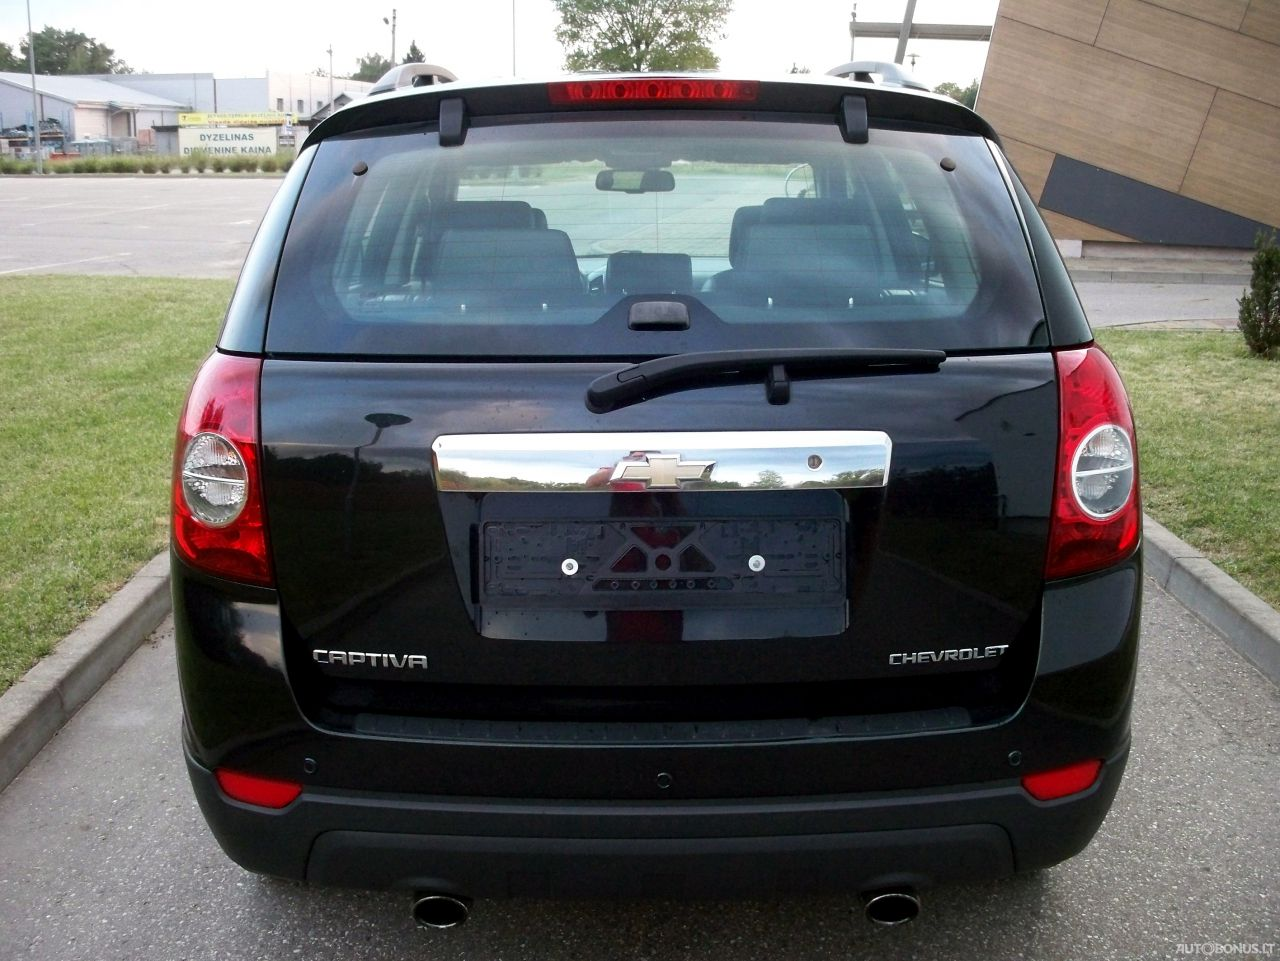 Chevrolet Captiva, Visureigis, 2011-12 | 3